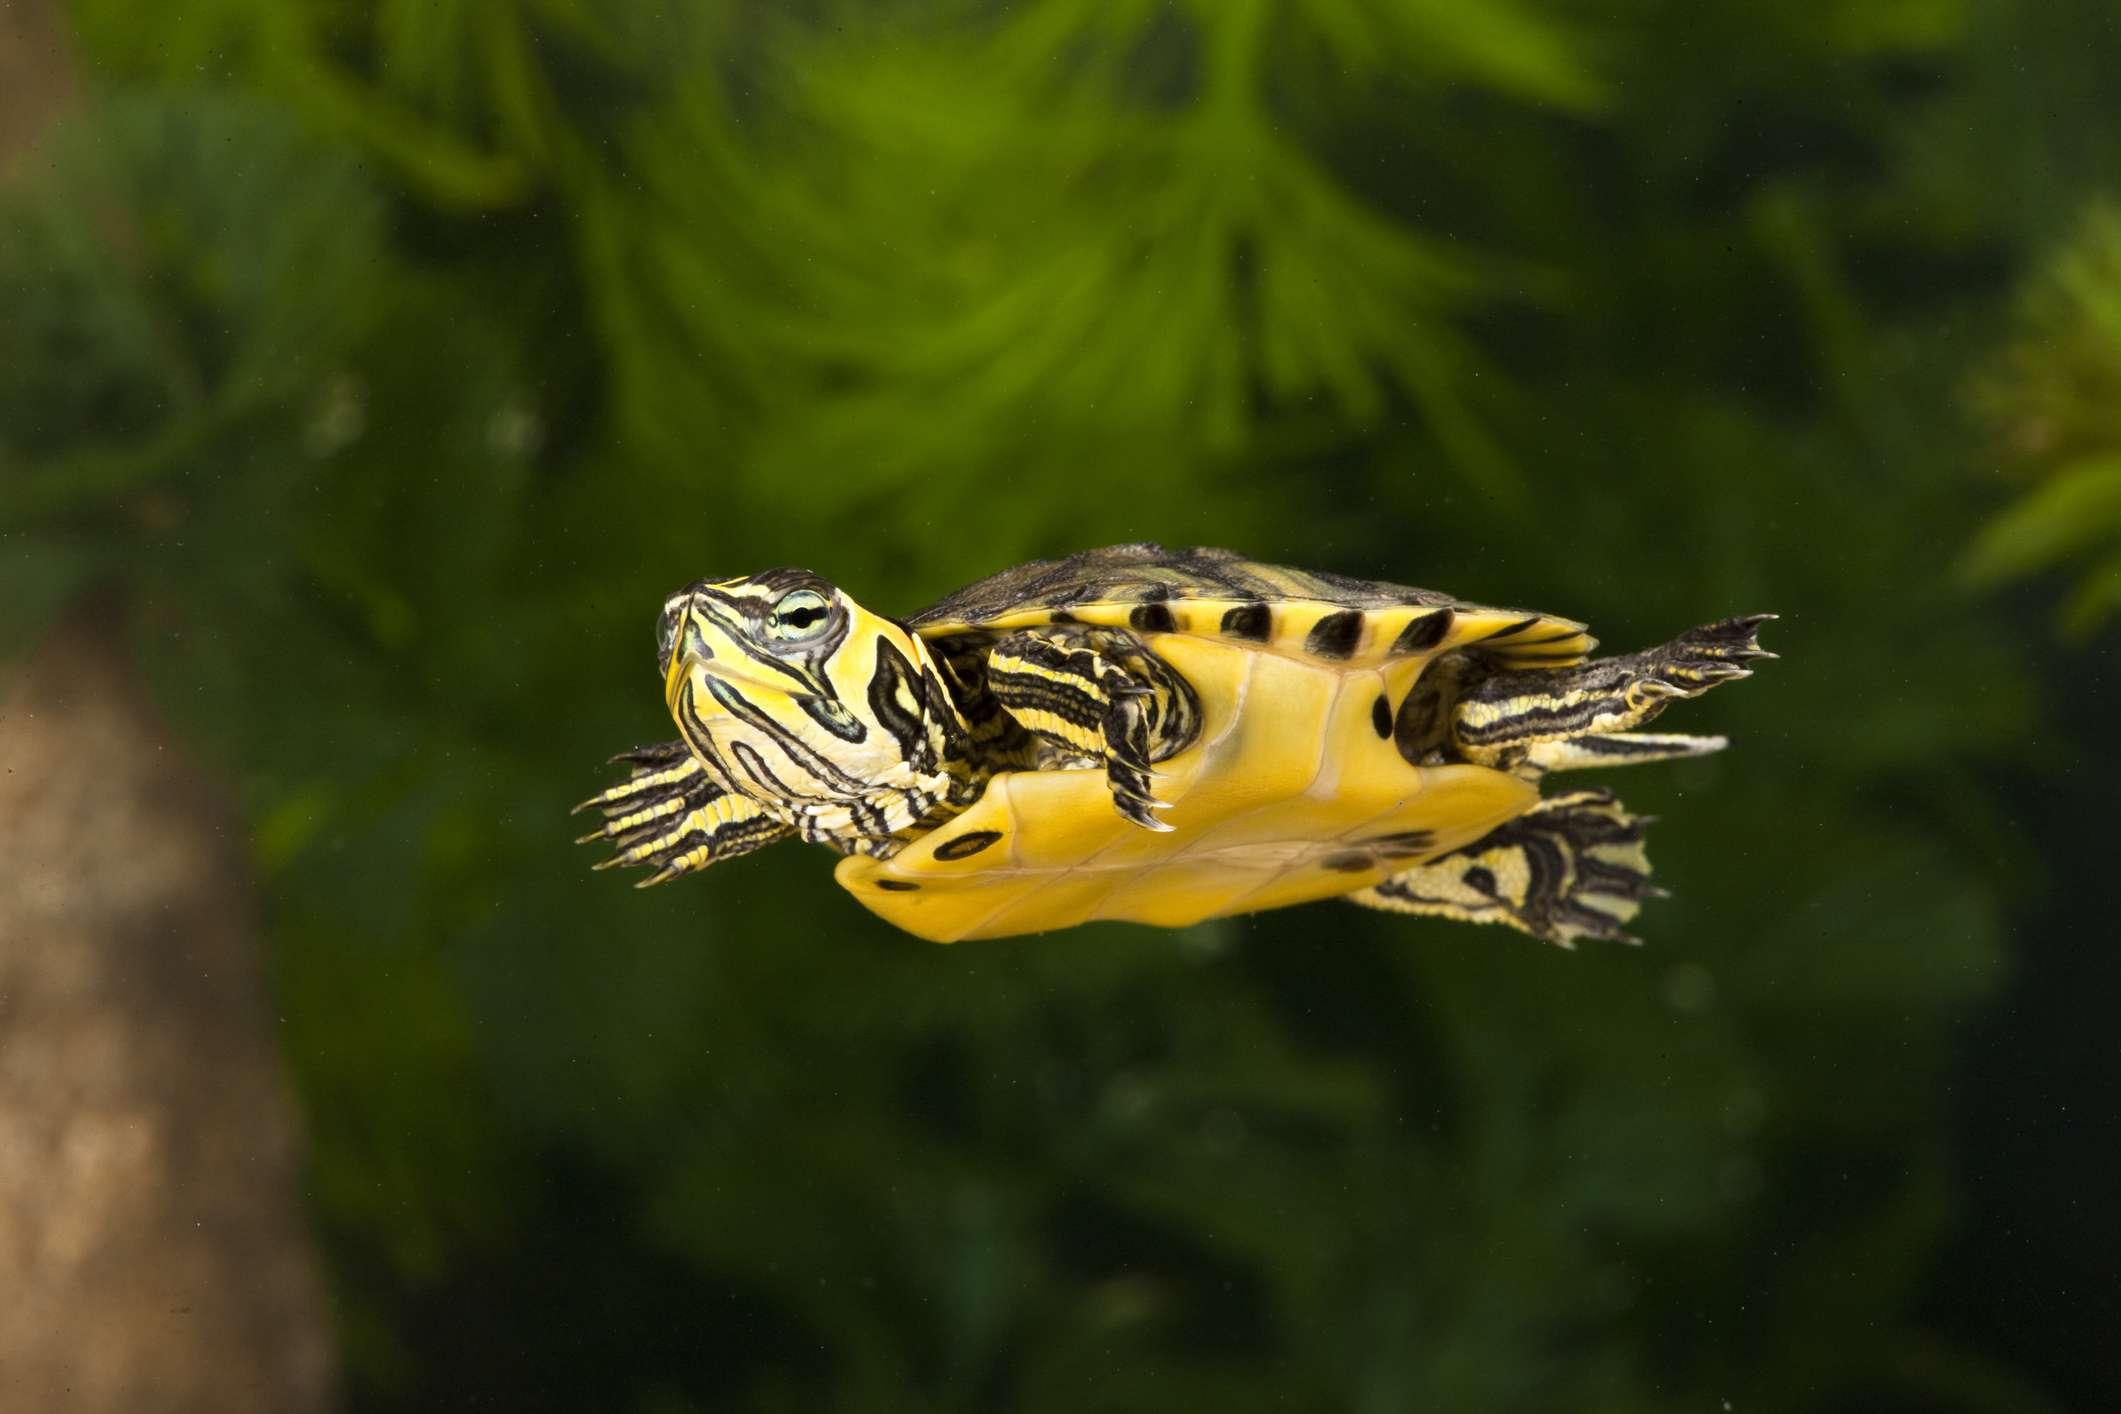 Yellow Belly Slider Swimming